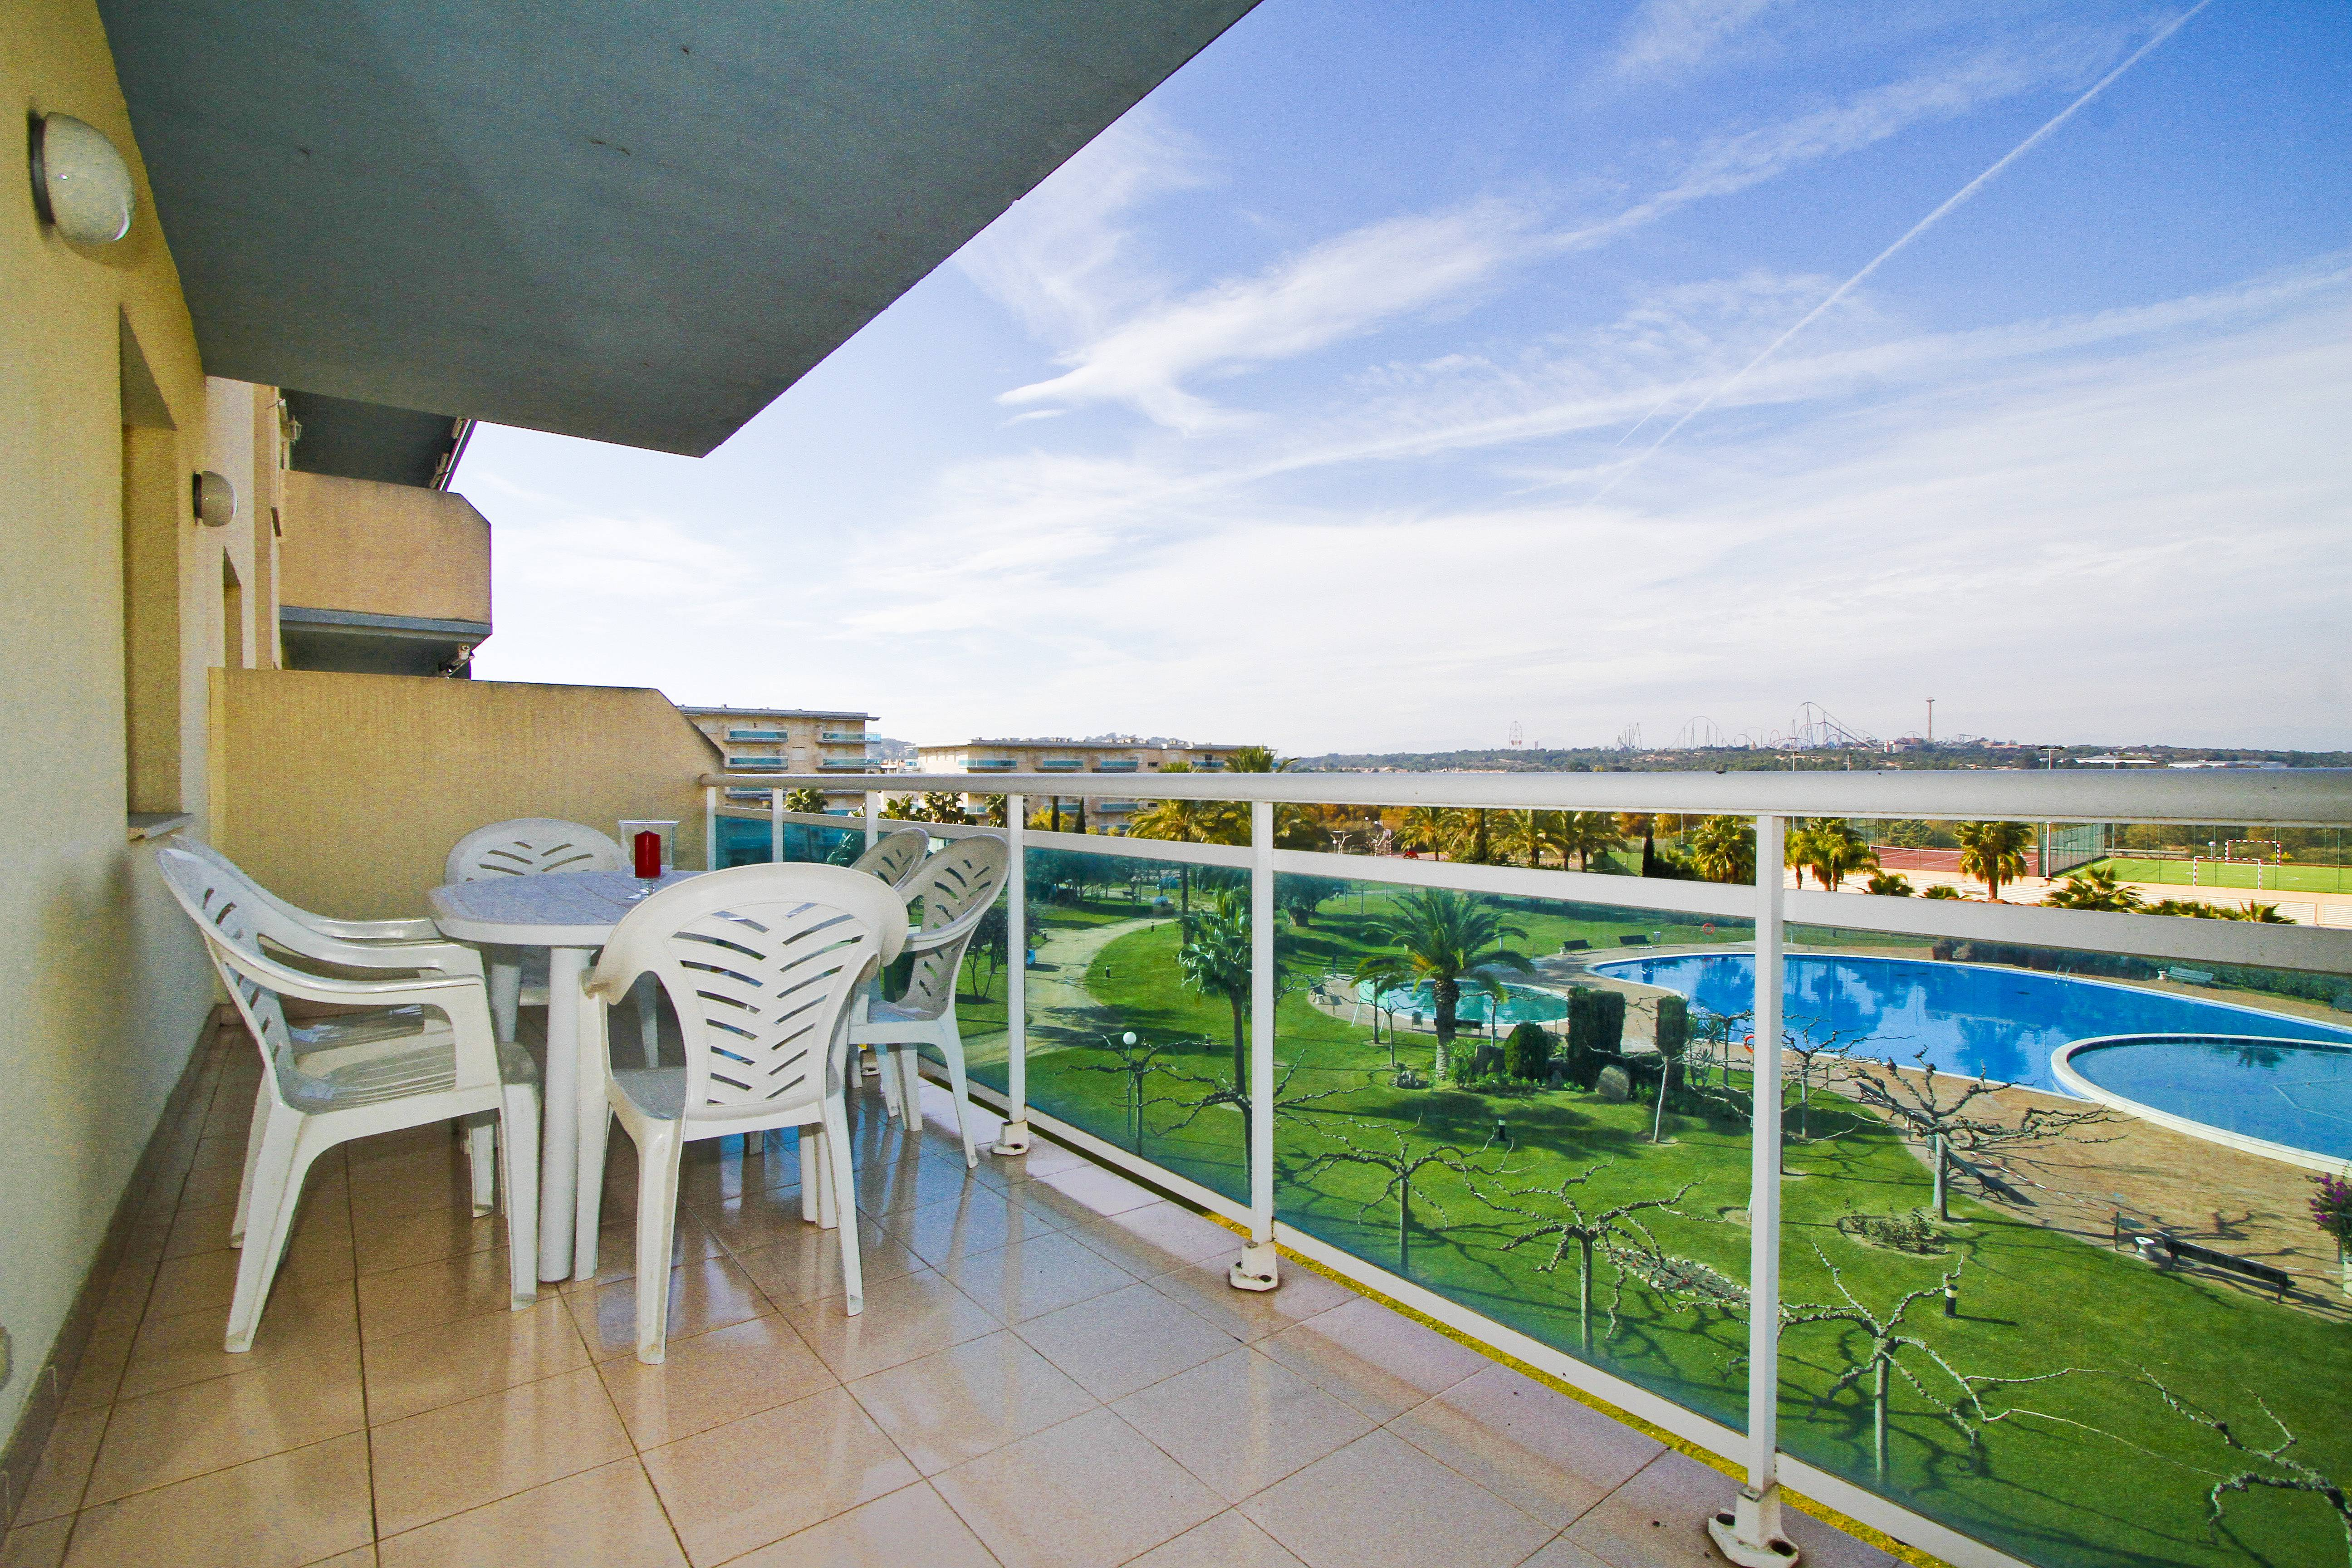 appartement avec belle piscine turismar la pineda On piscines vila seca